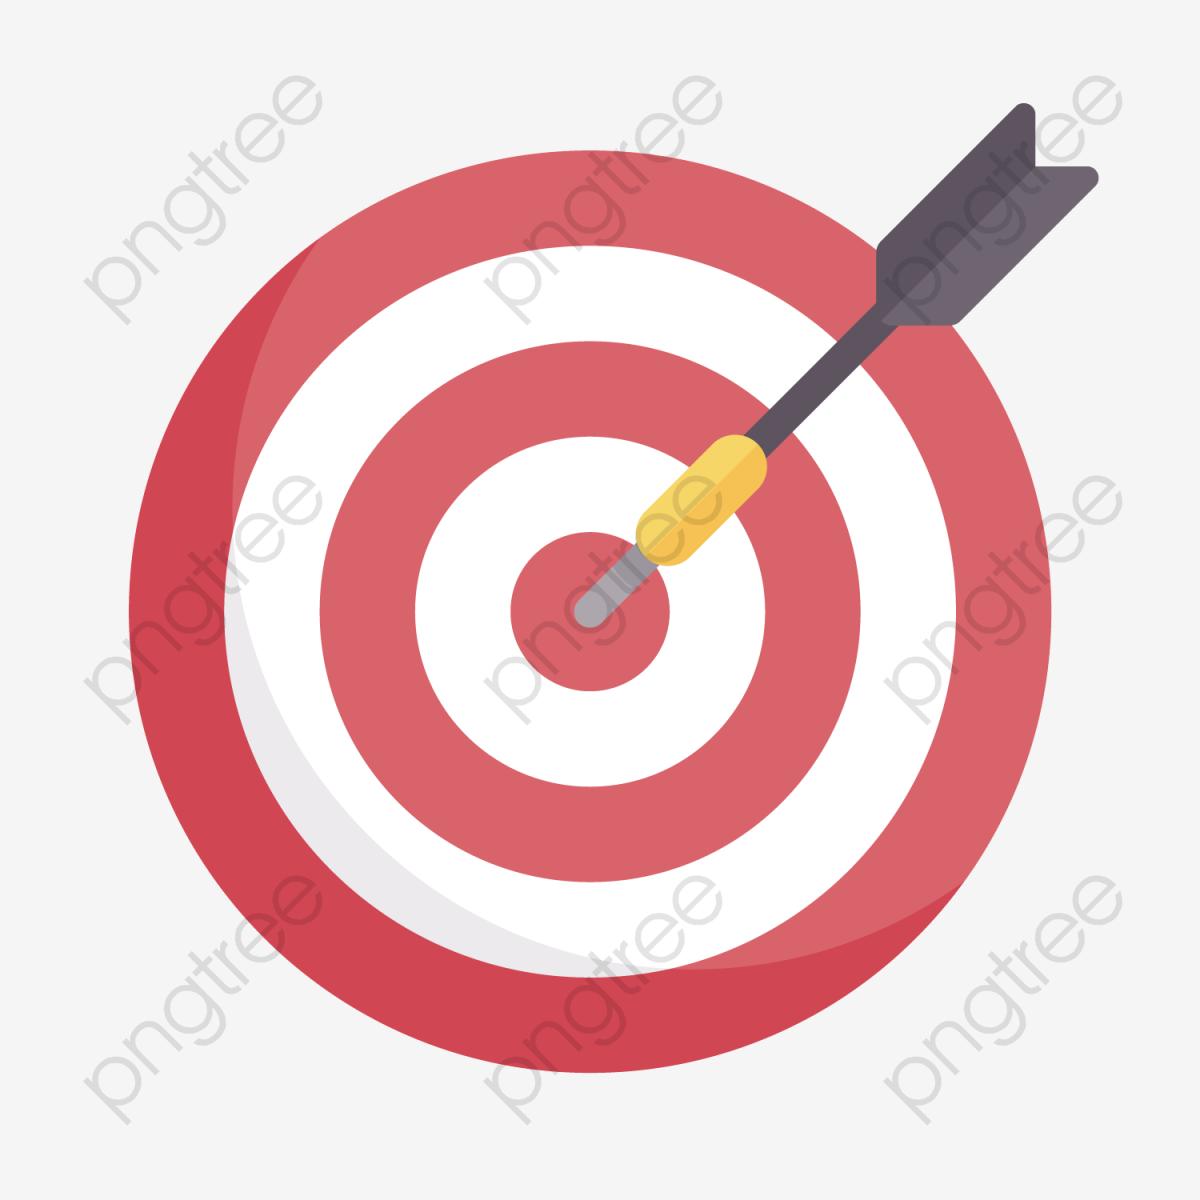 Red Archery Target, Gules, Circular, Texture PNG Transparent Clipart.